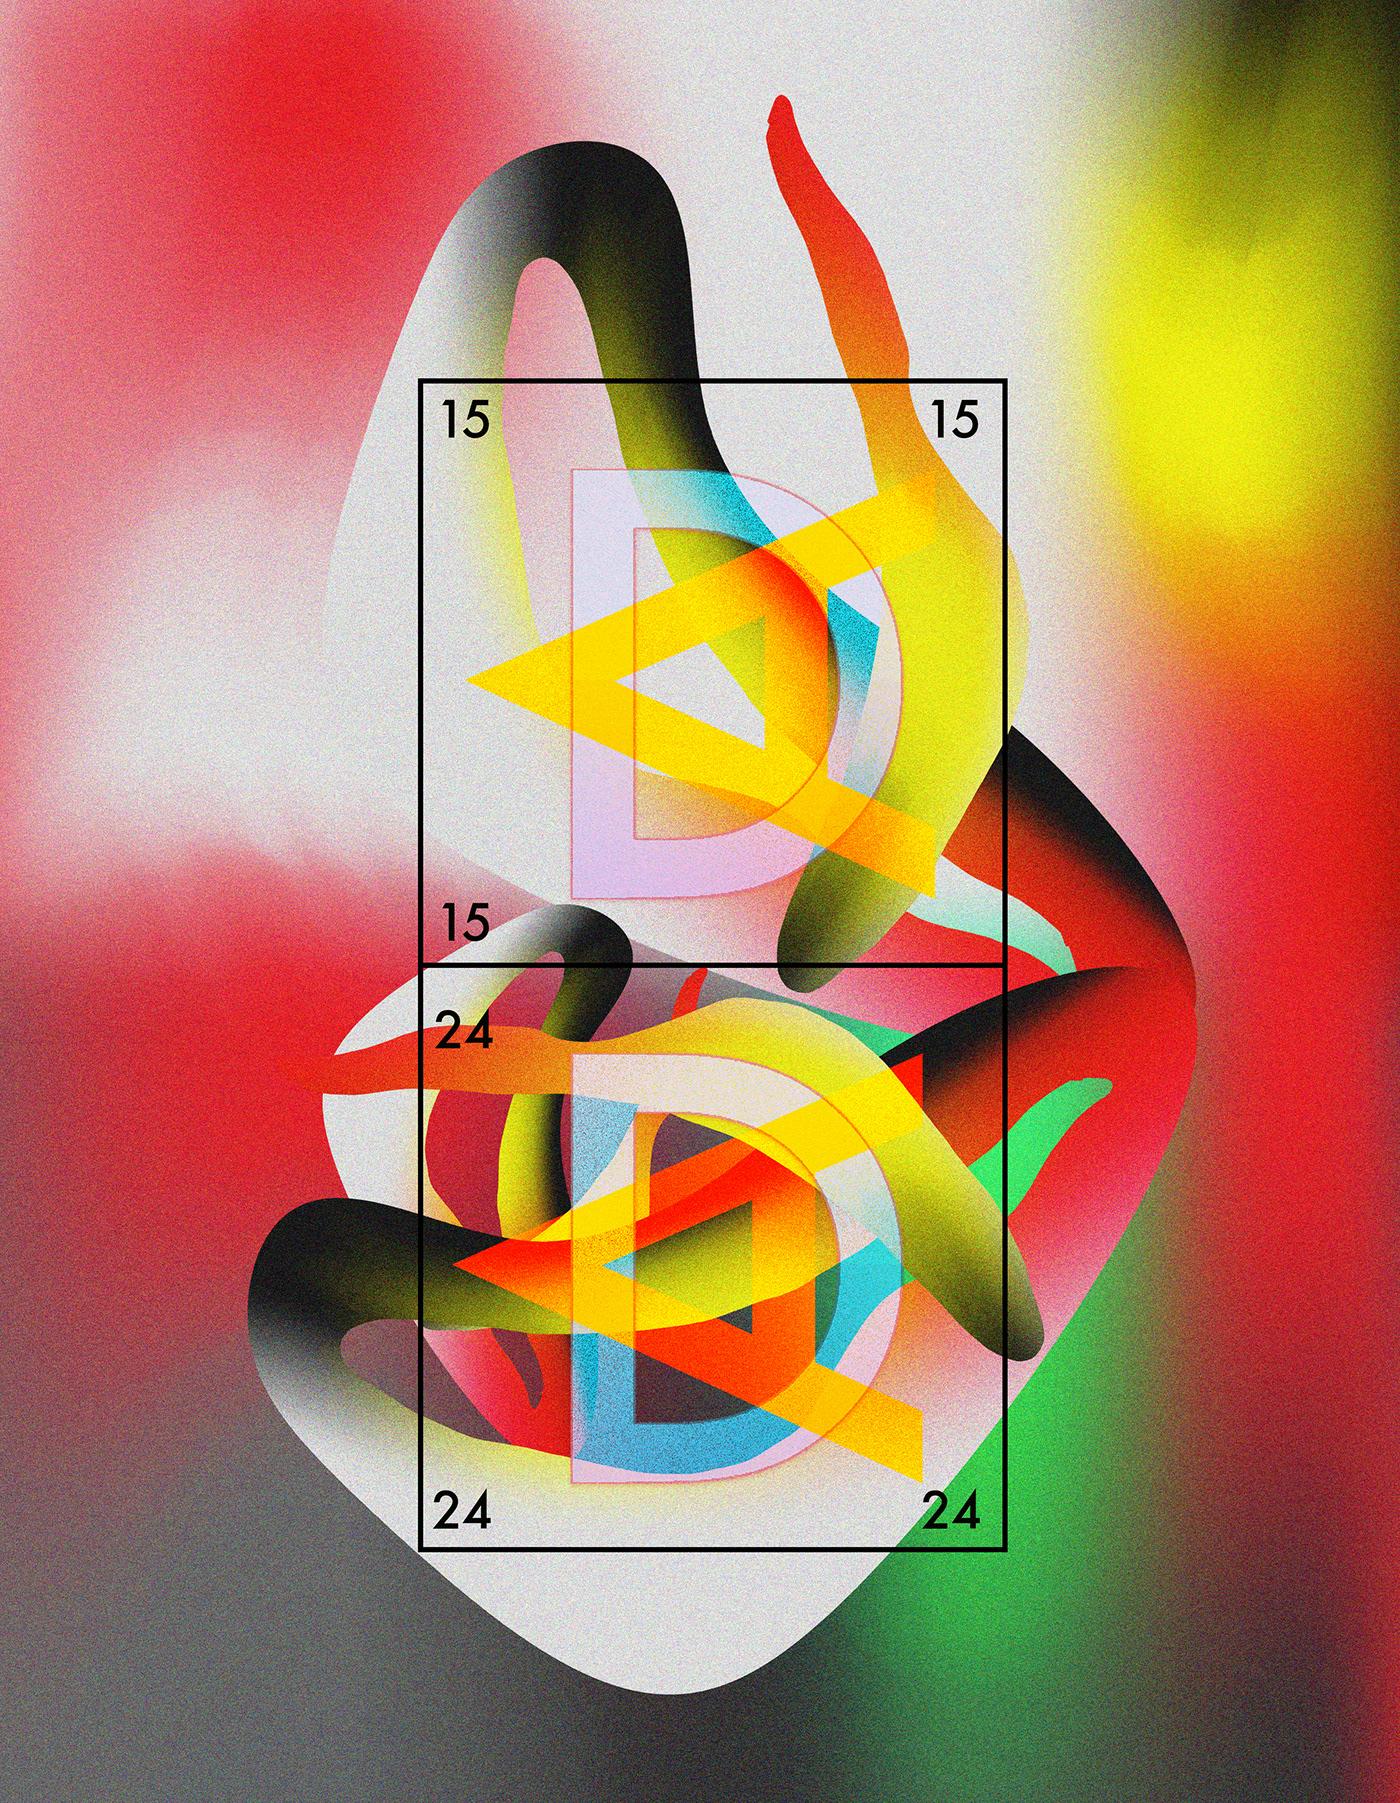 posters graphisme ILLUSTRATION  cinema 4d illlustrator photoshop Baugasm LHACENE skillshare